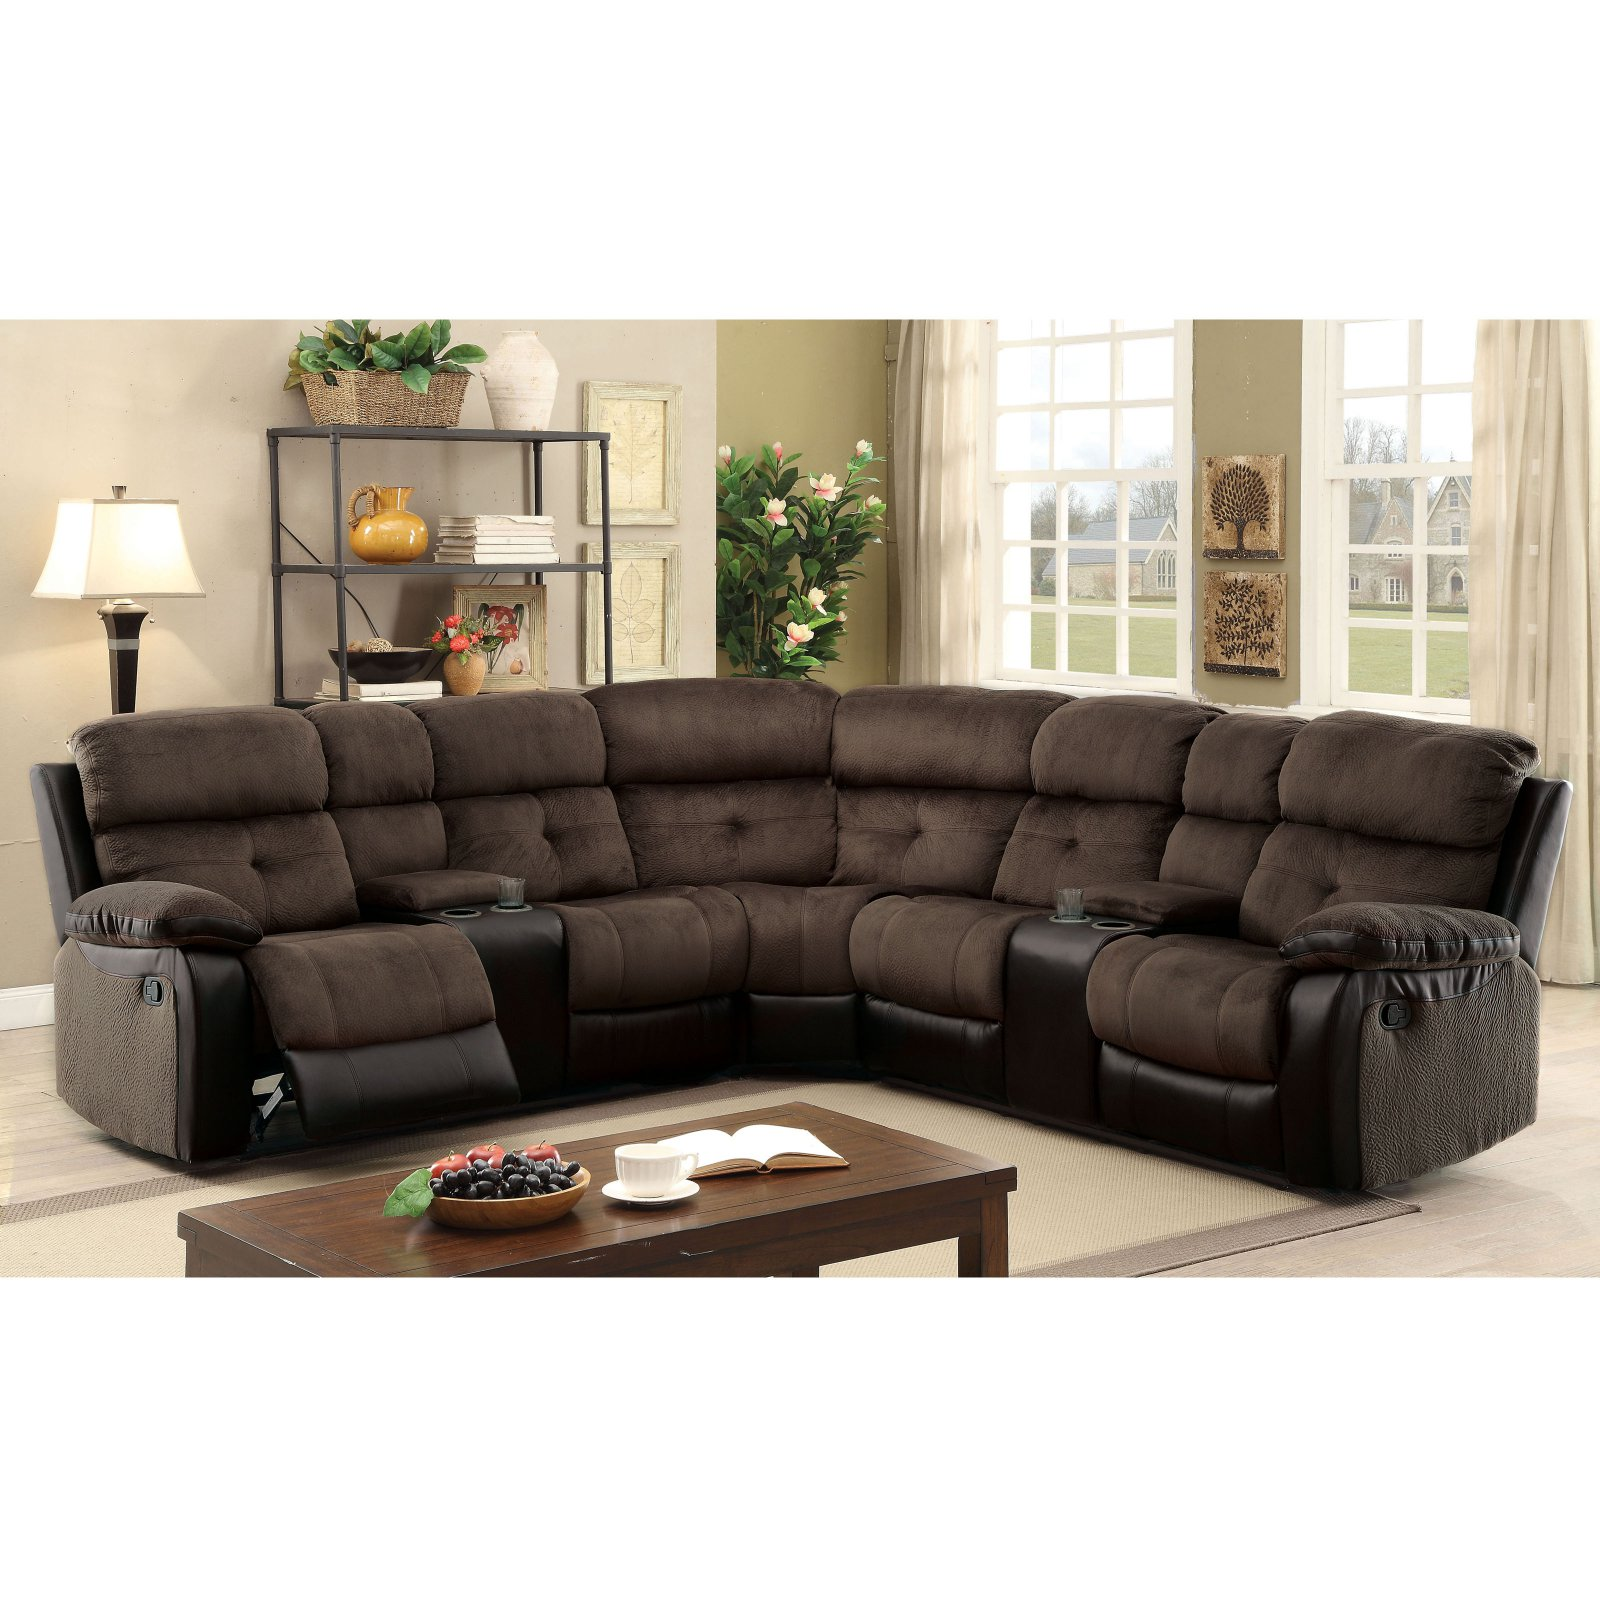 Furniture of America Mervin Reclining Sectional Sofa